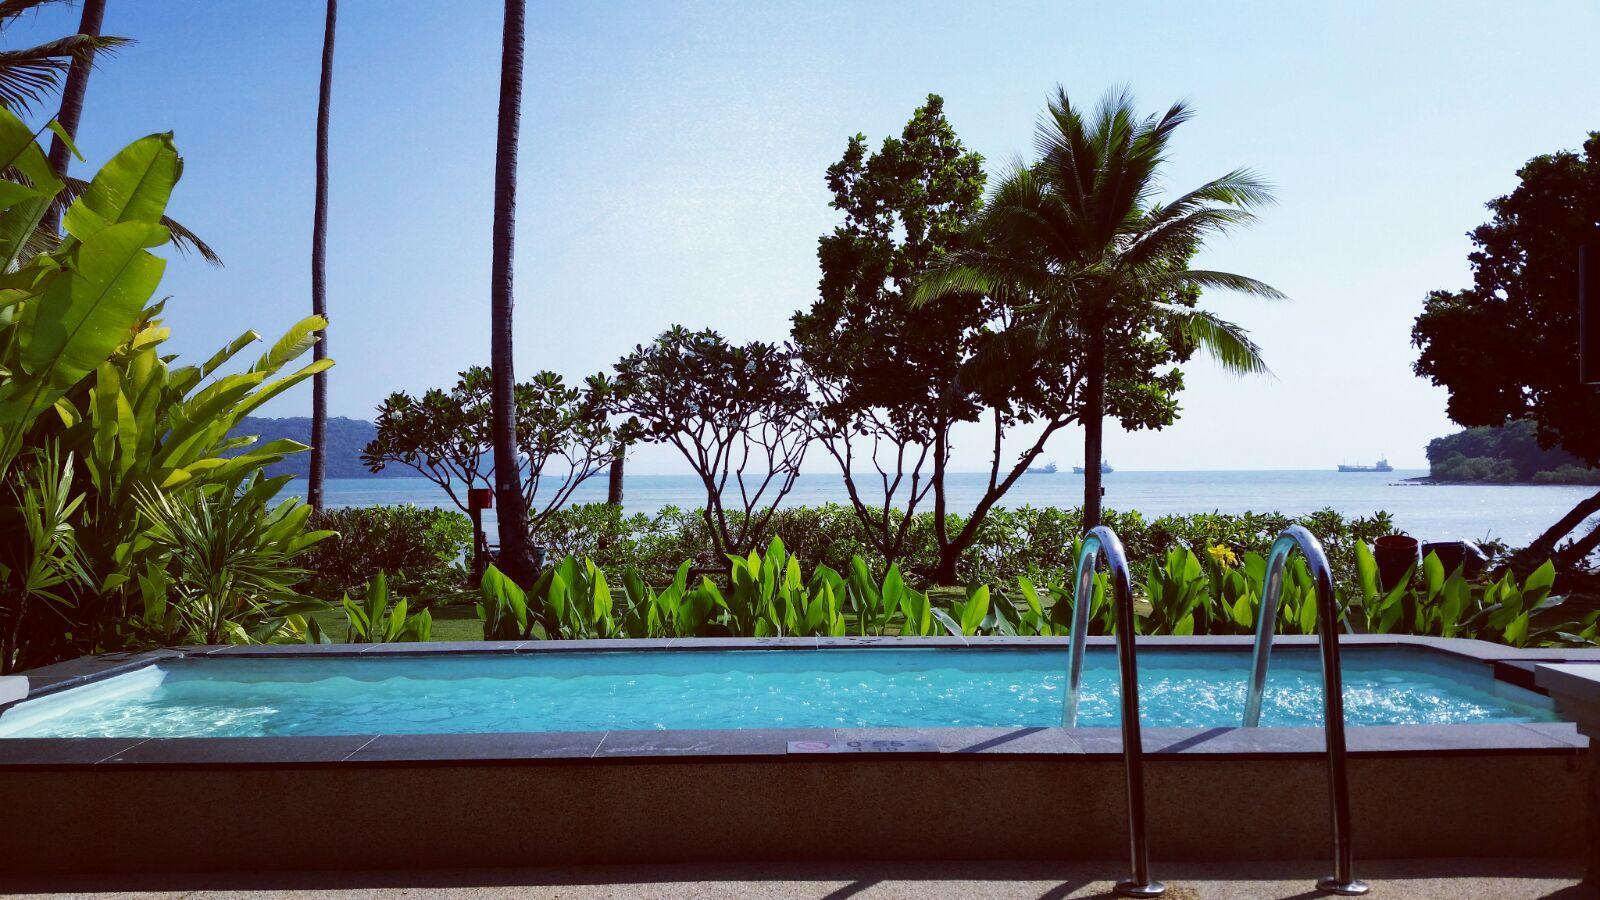 My pool villa view Room 8032